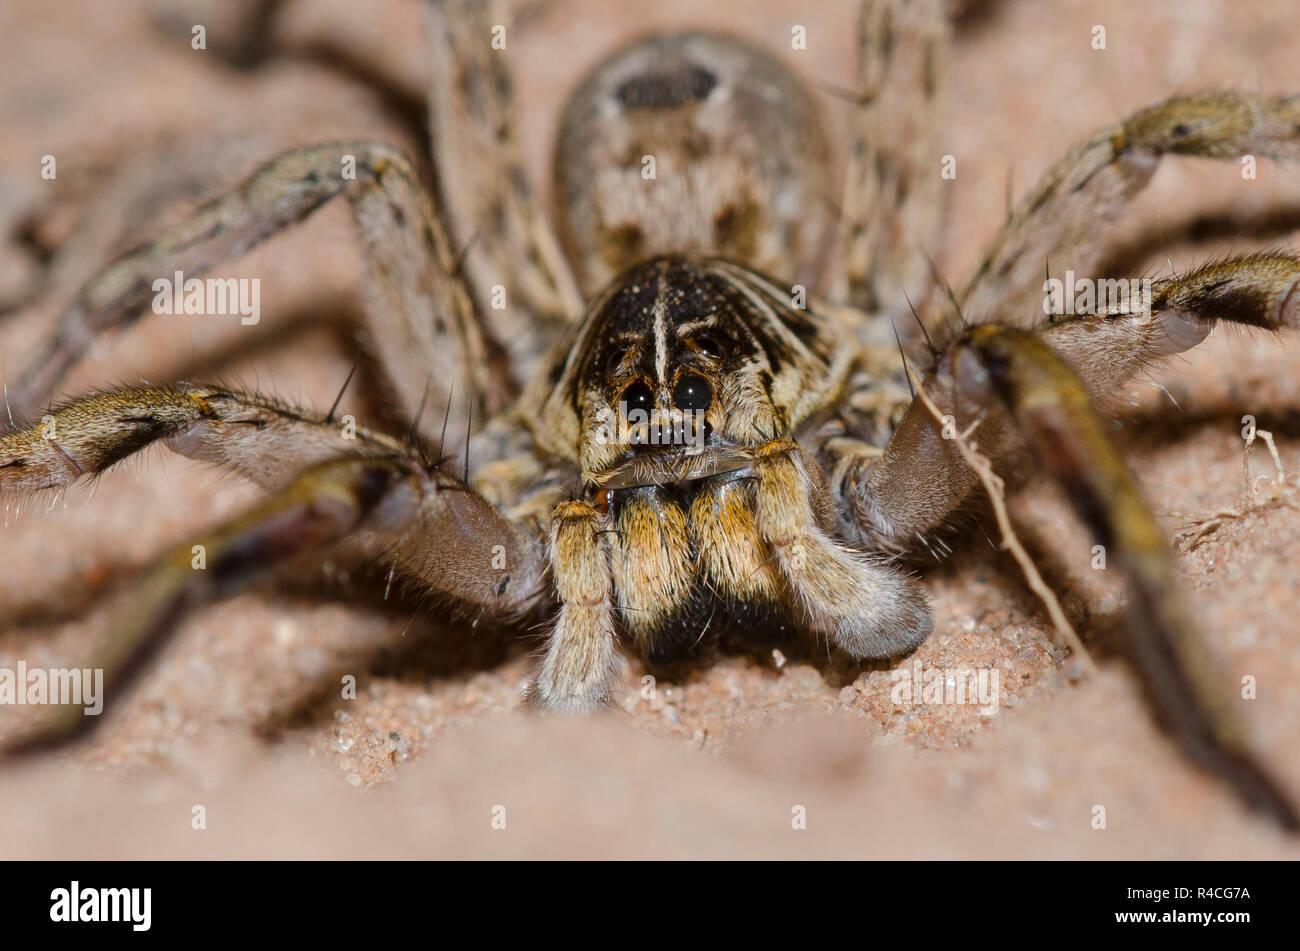 Wolf Spider, Hogna baltimoriana, male - Stock Image